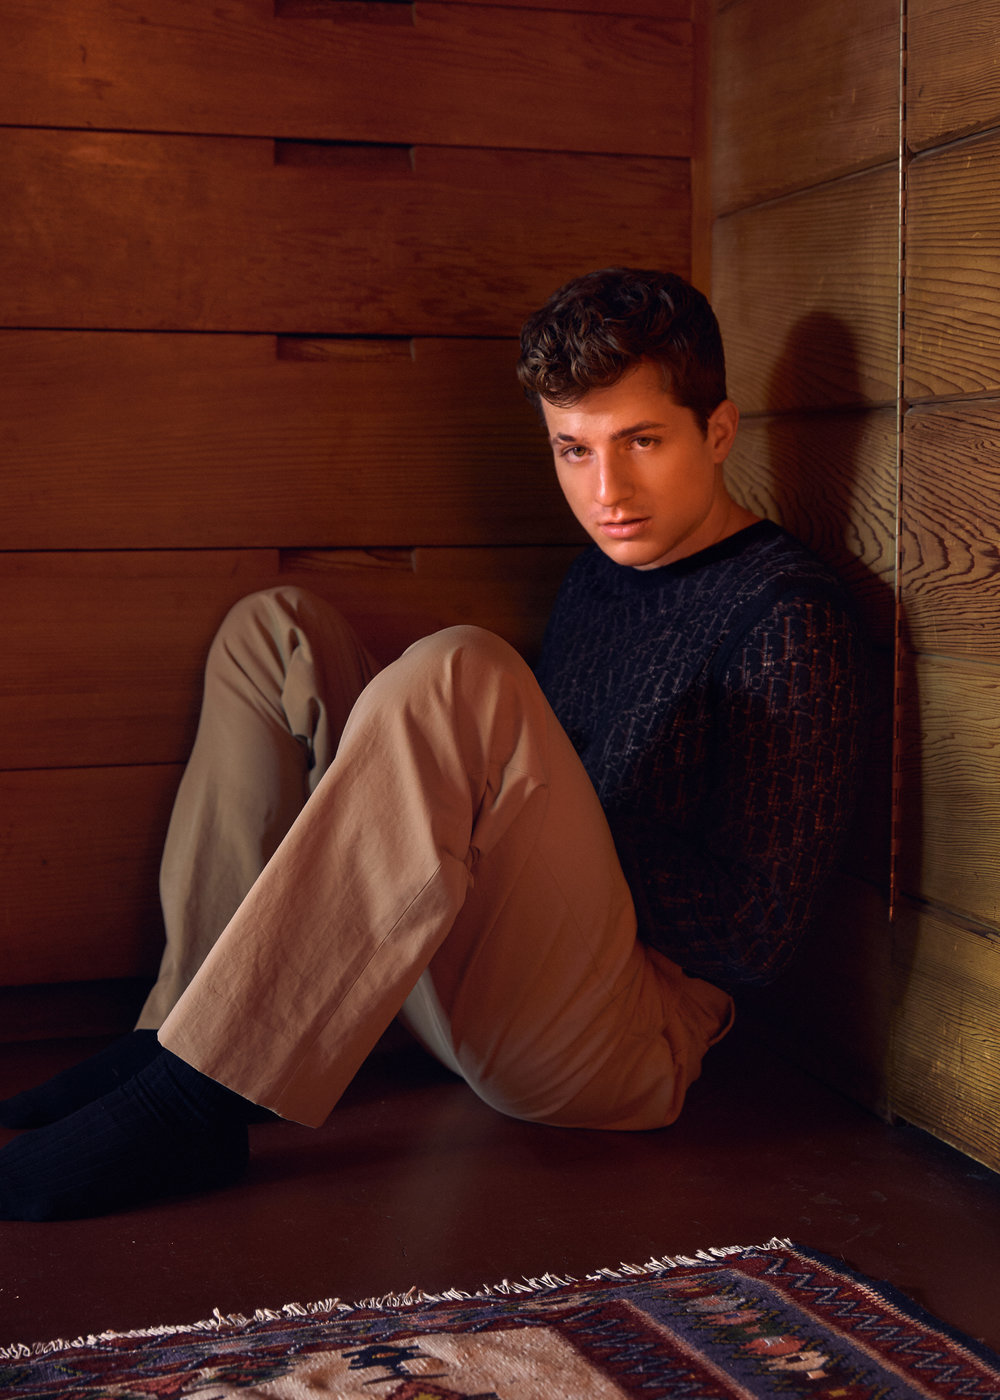 sweater DIOR, pants MAISON MARGIELA